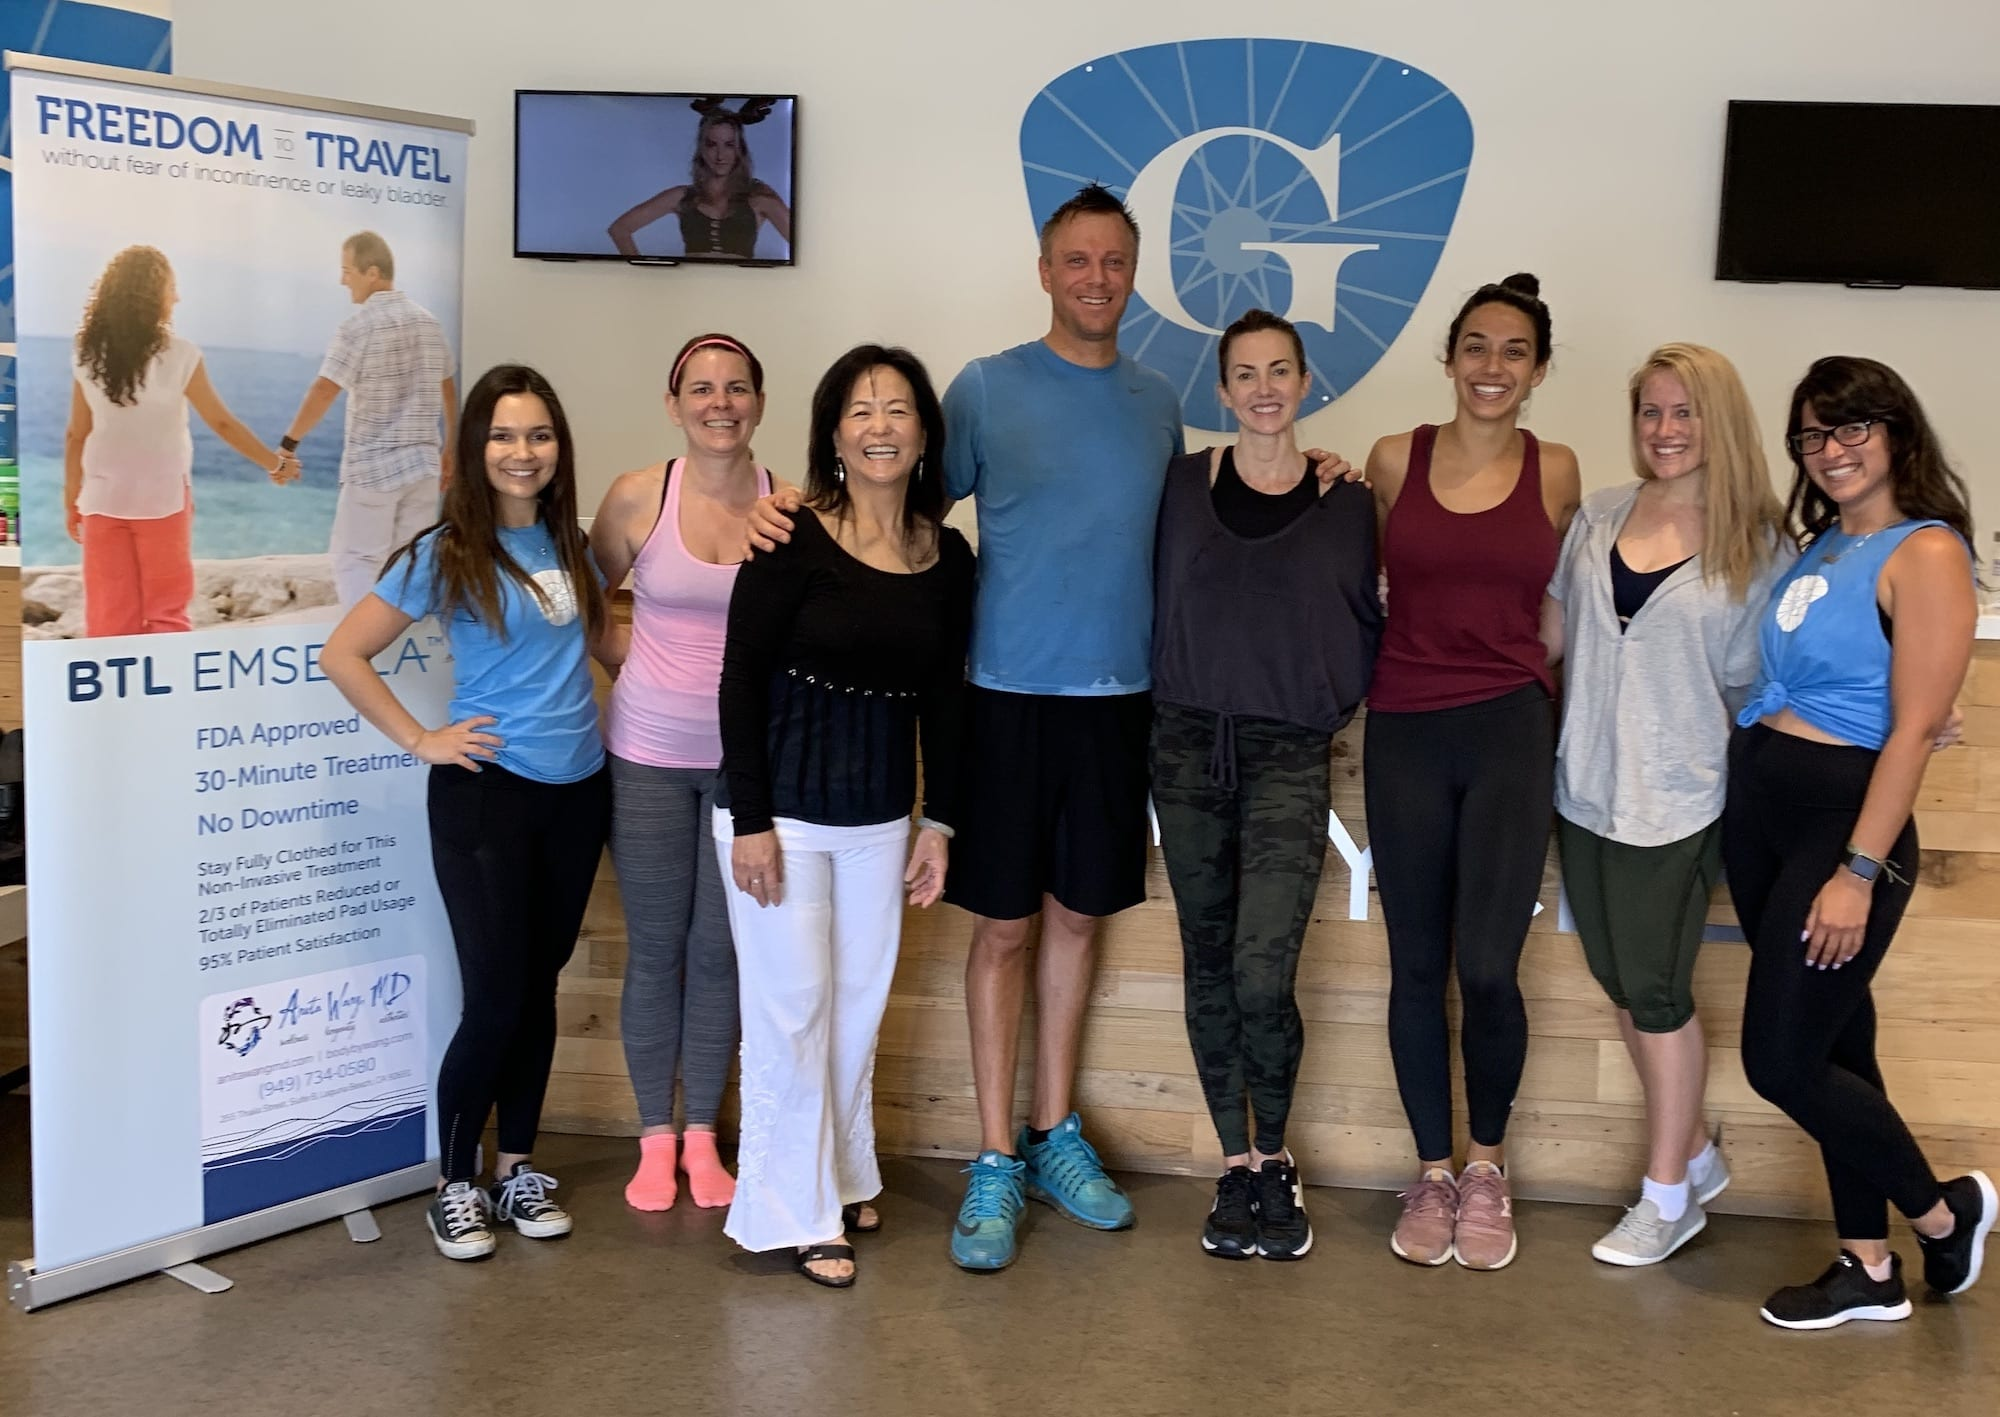 Anita Wang MD teaches Wellness at GritCycle